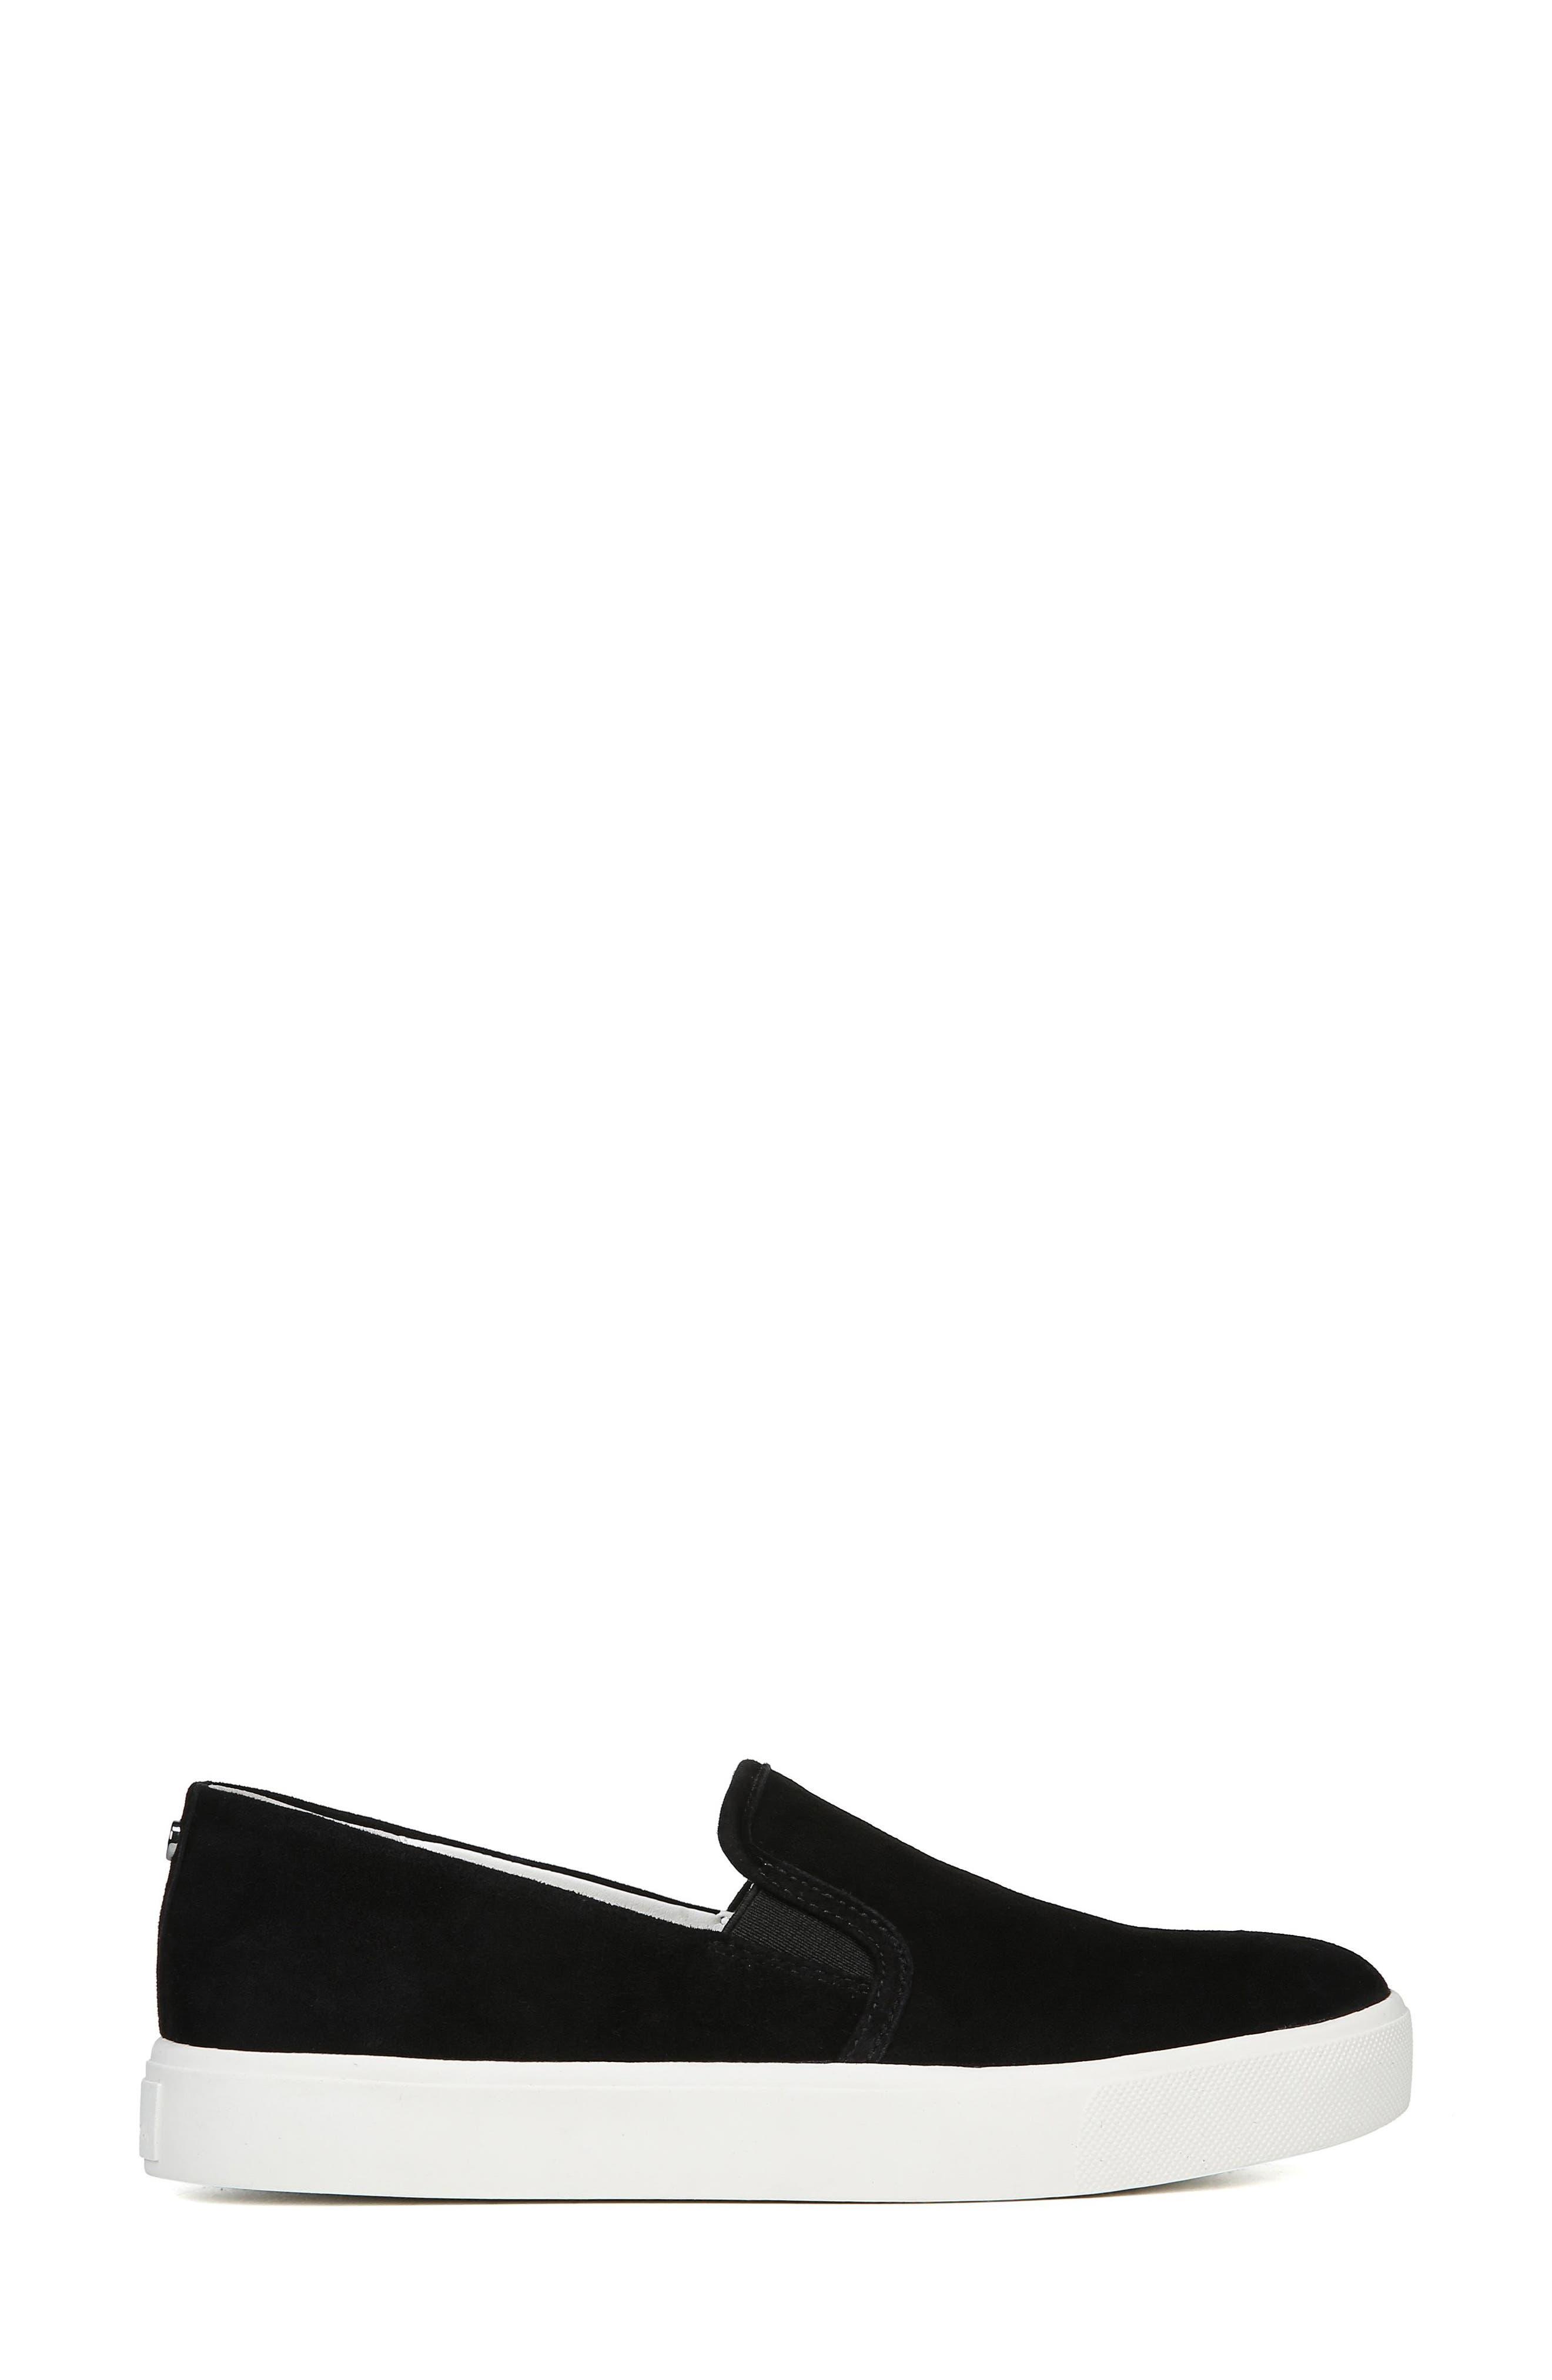 Elton Slip-On Sneaker,                             Alternate thumbnail 3, color,                             BLACK SUEDE LEATHER